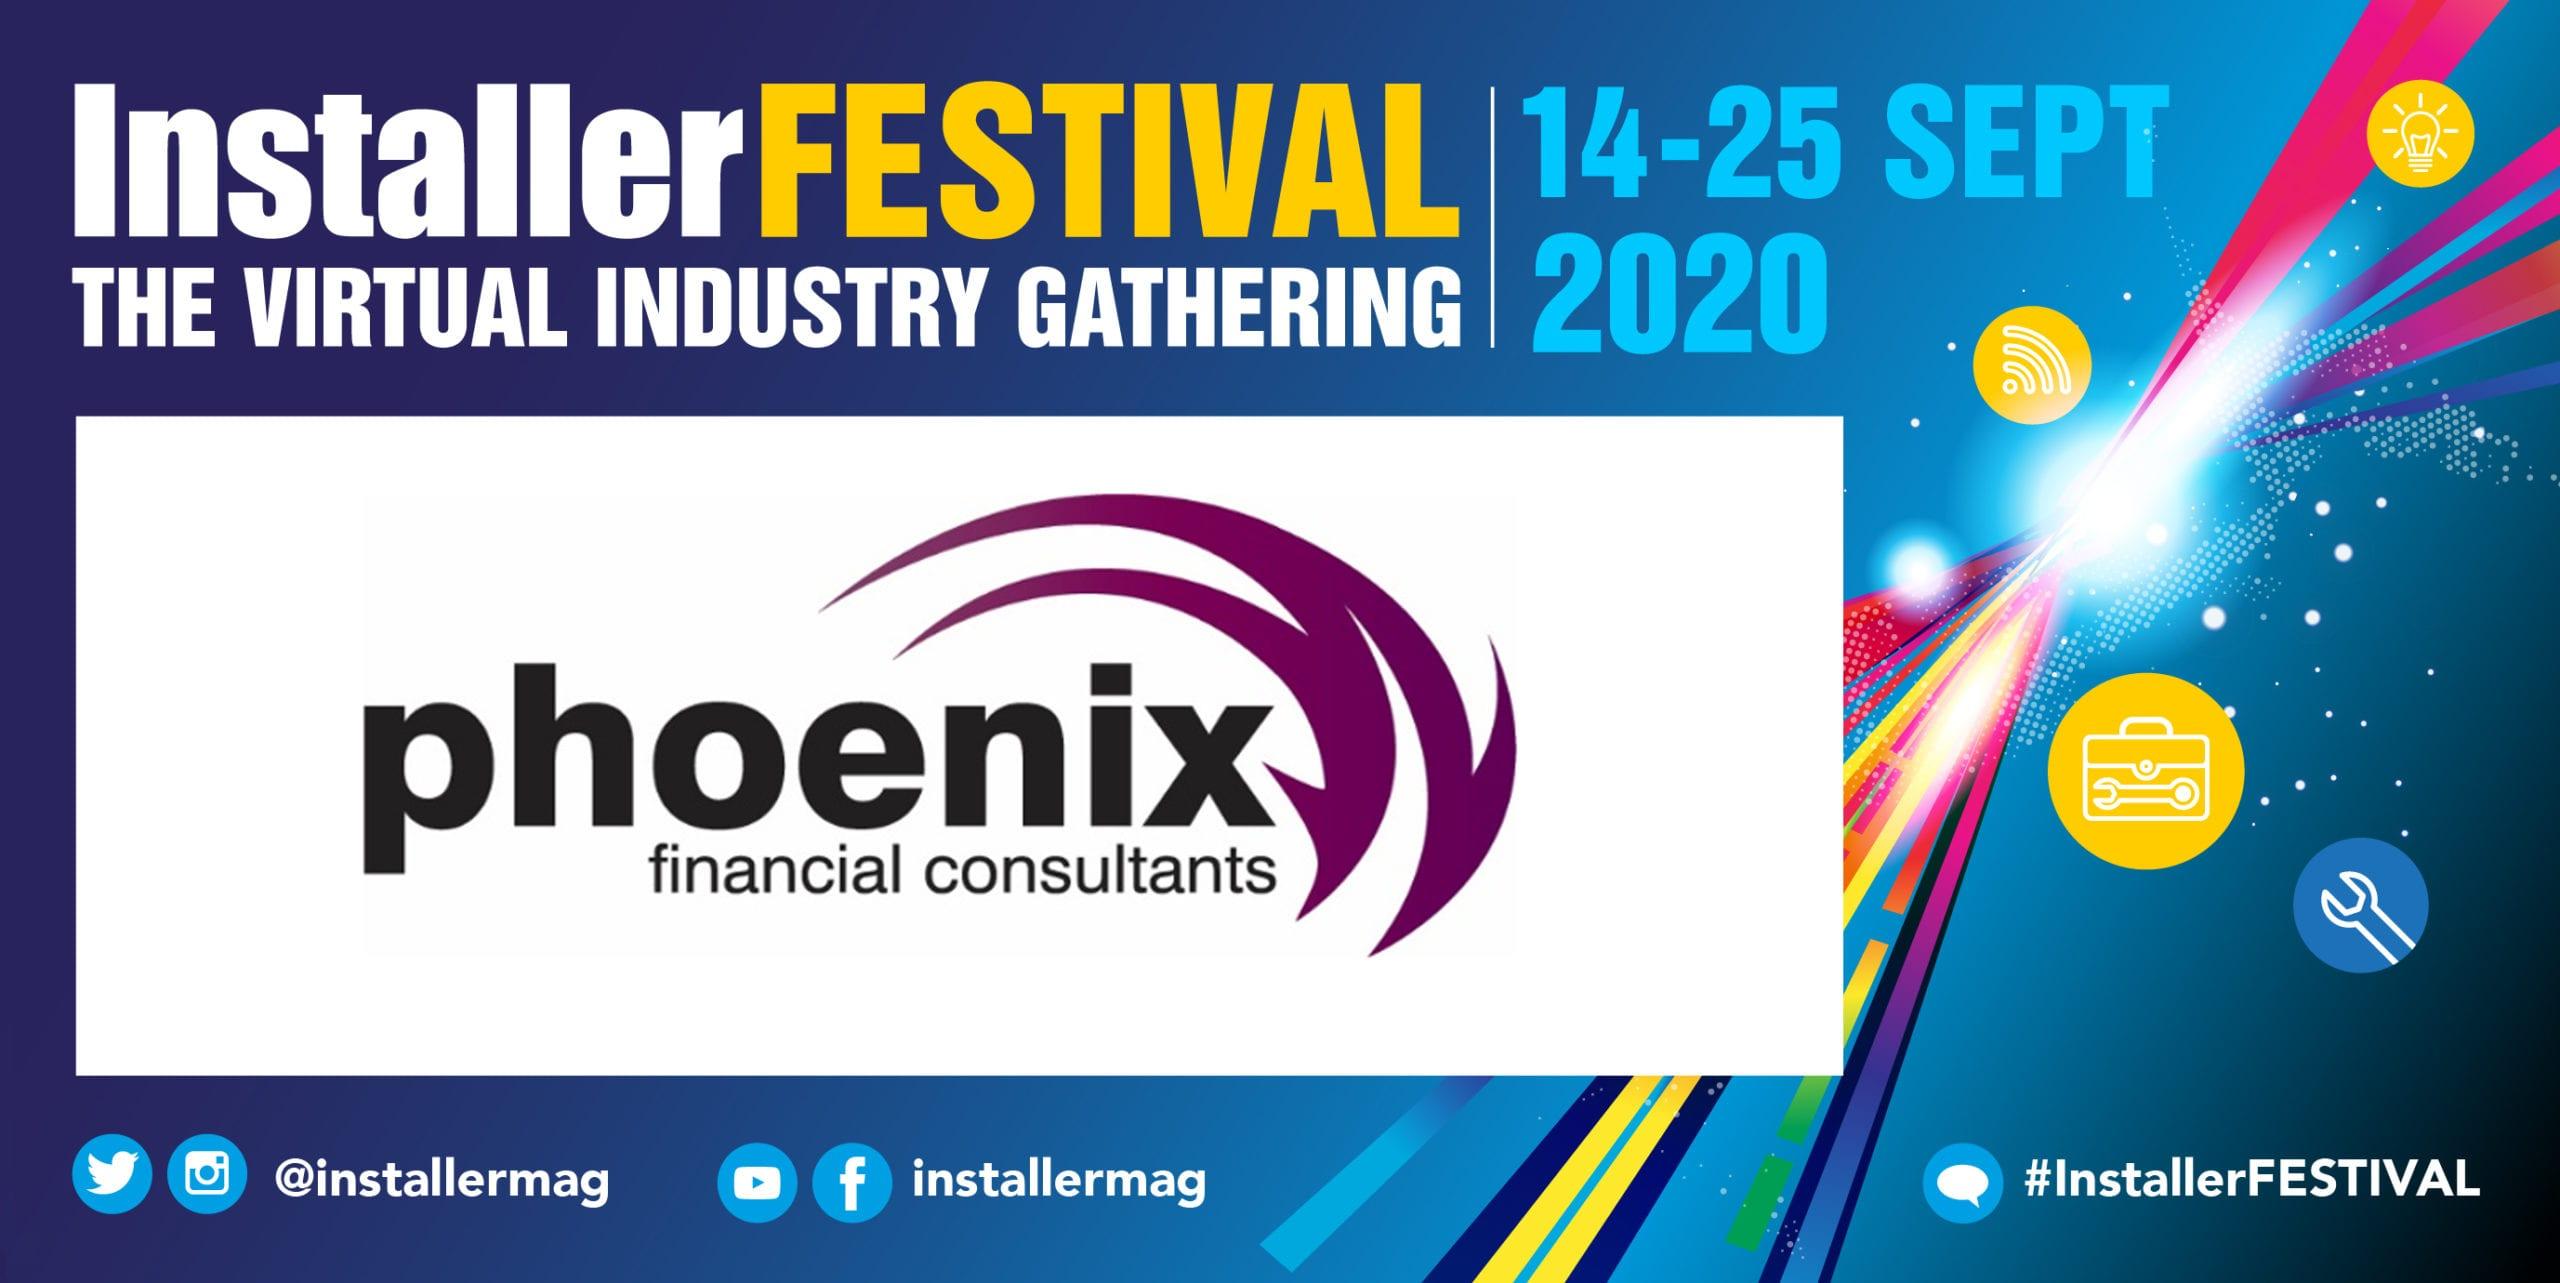 Popular - Phoenix Financial Consultants sponsors #InstallerFESTIVAL